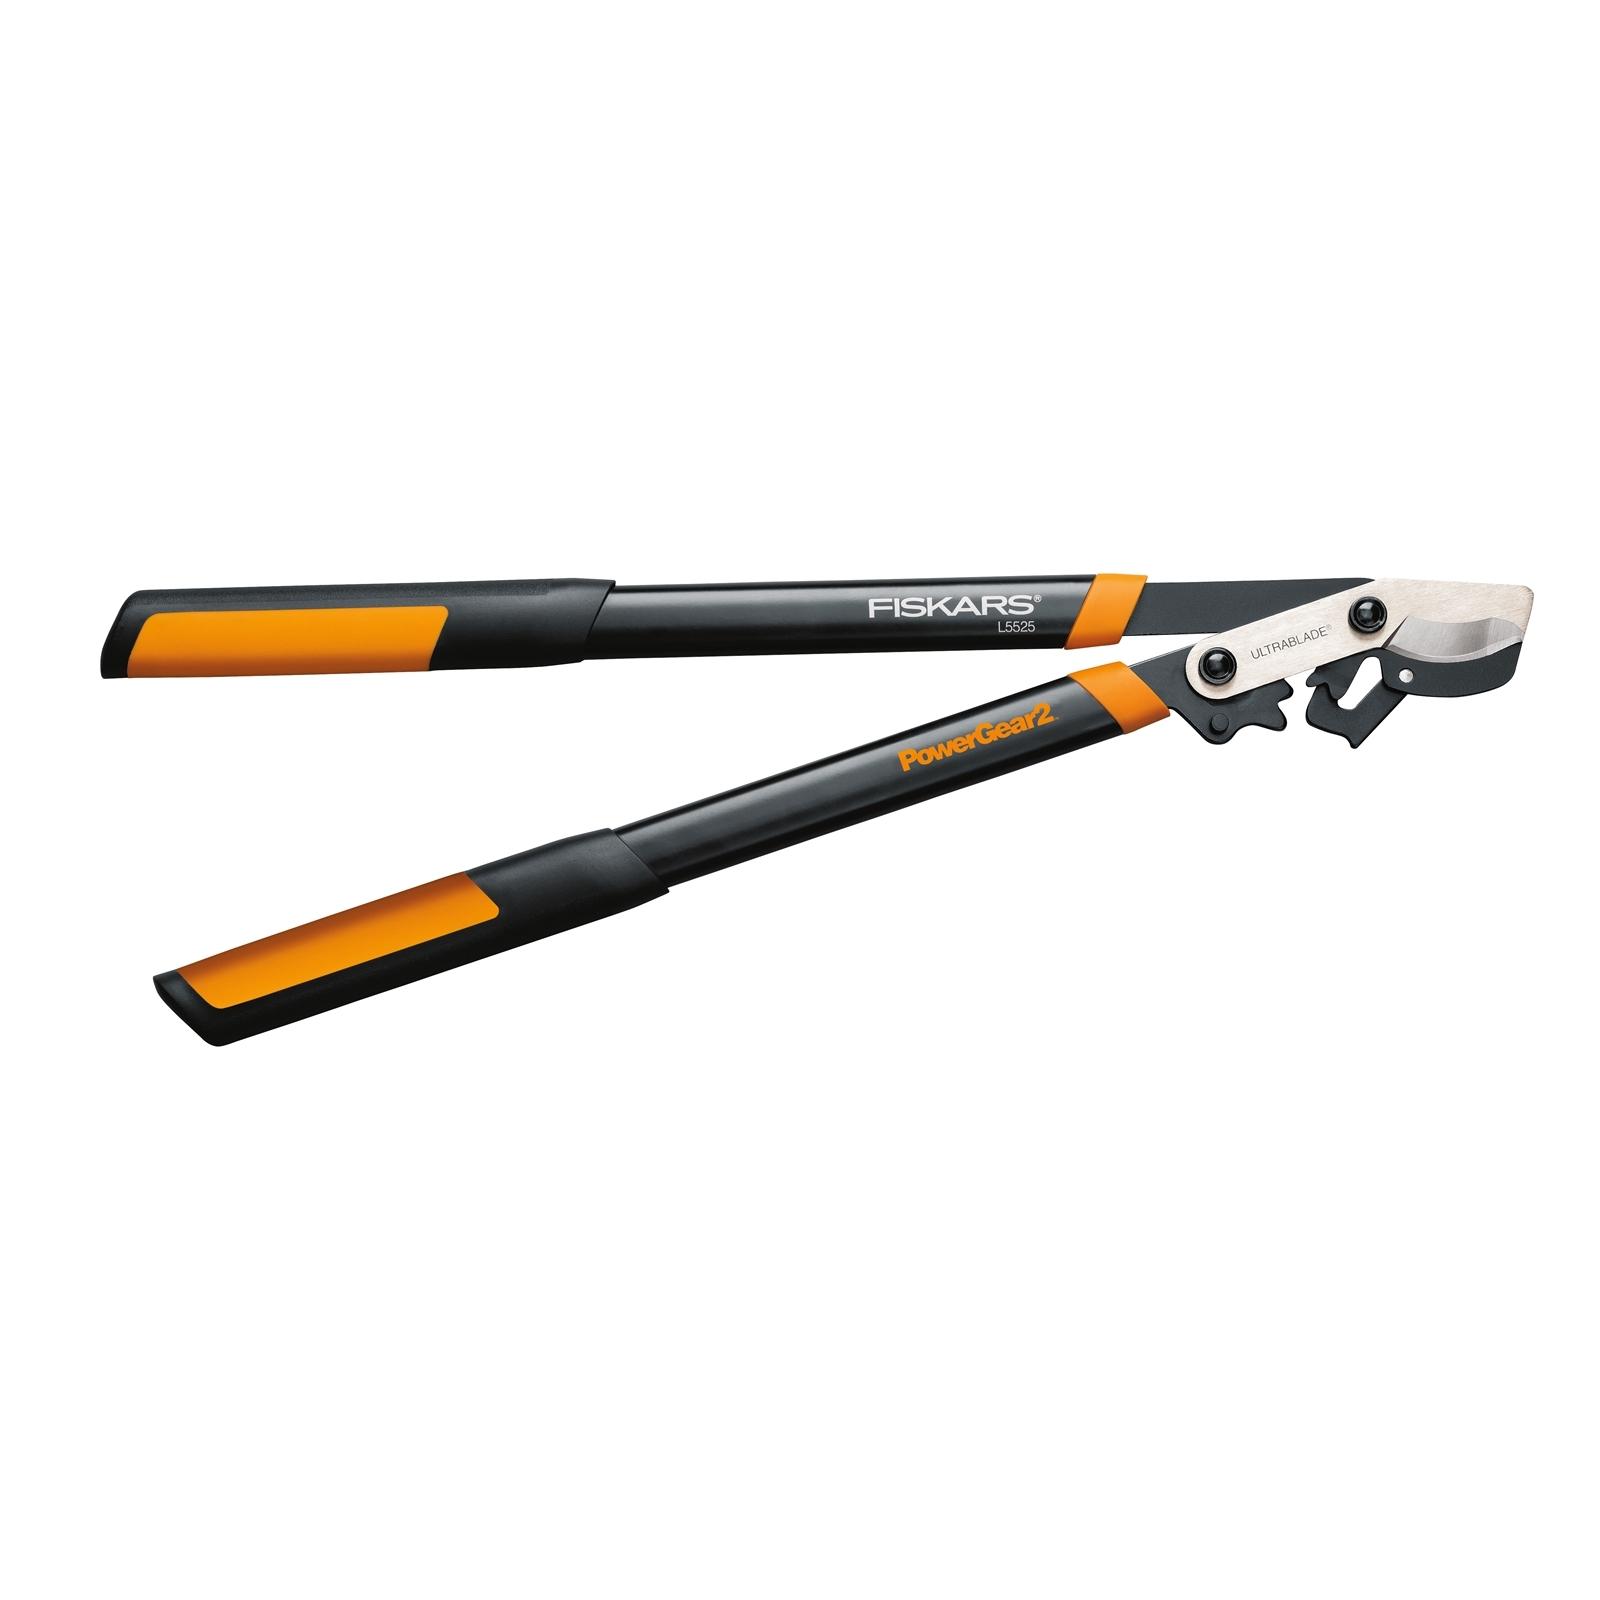 Fiskars Medium Powergear2 Ultrablade Bypass Lopper